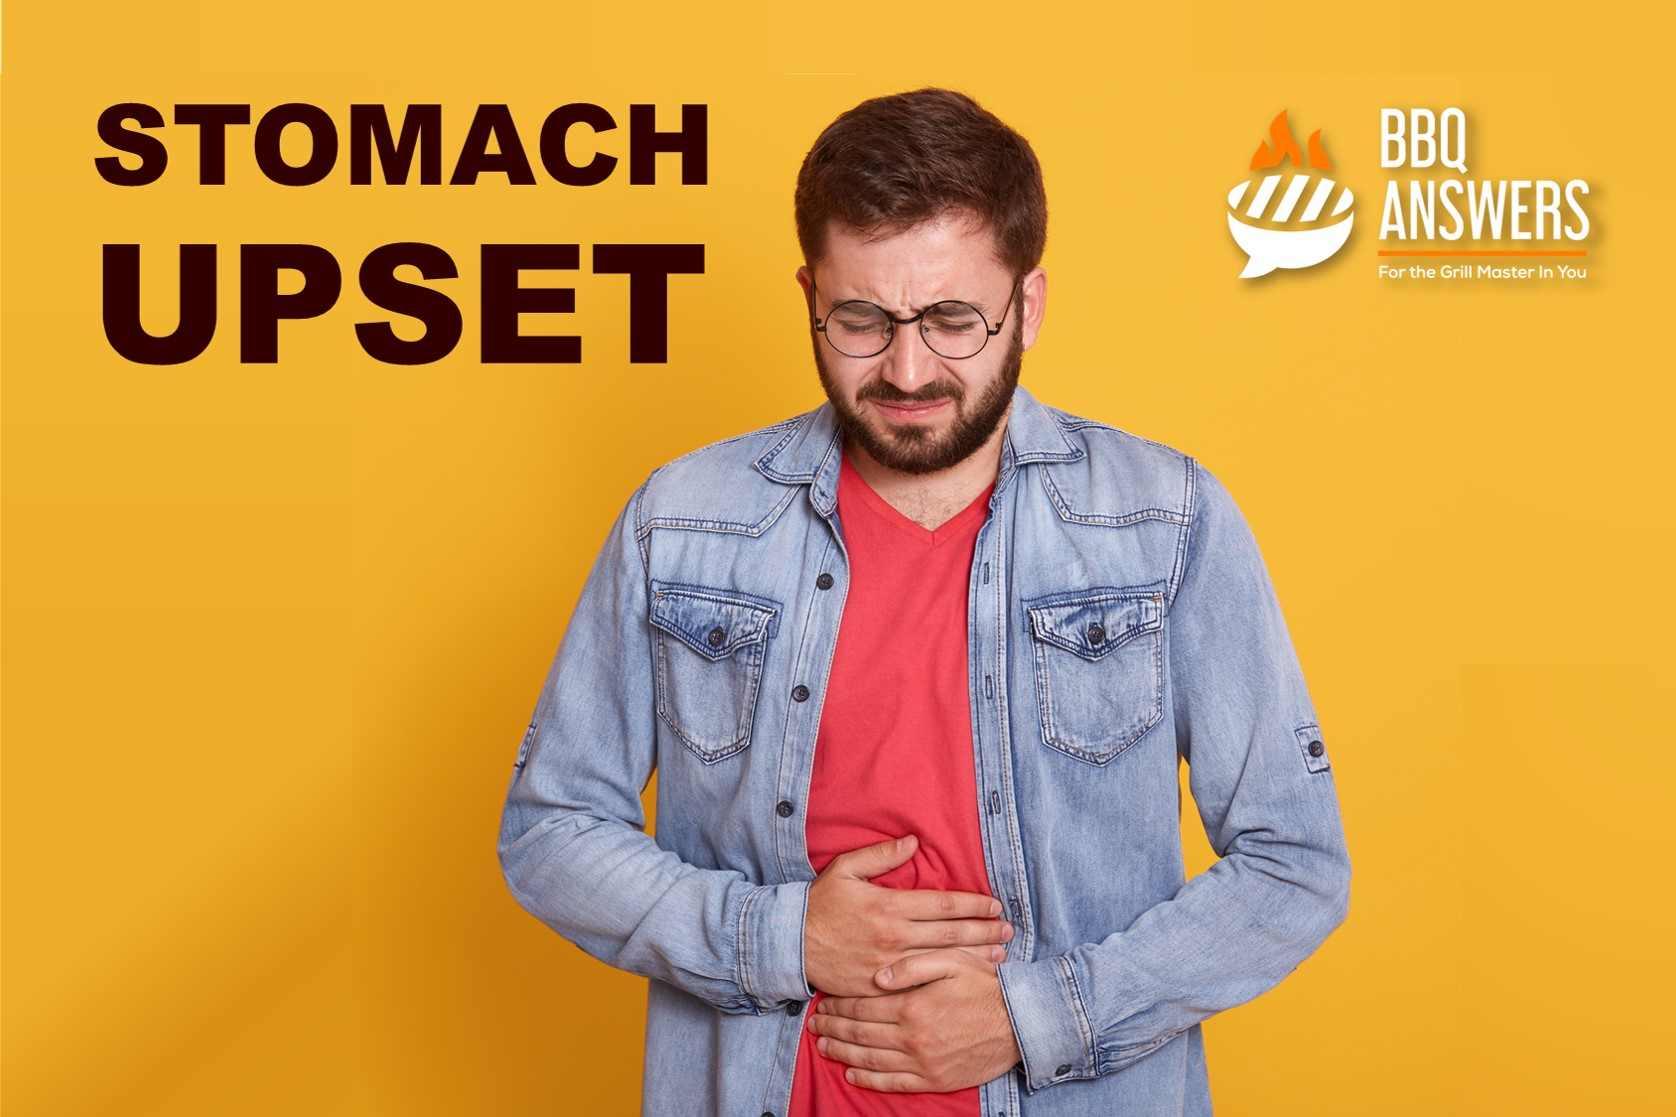 BBQ Sauce Stomach Upset